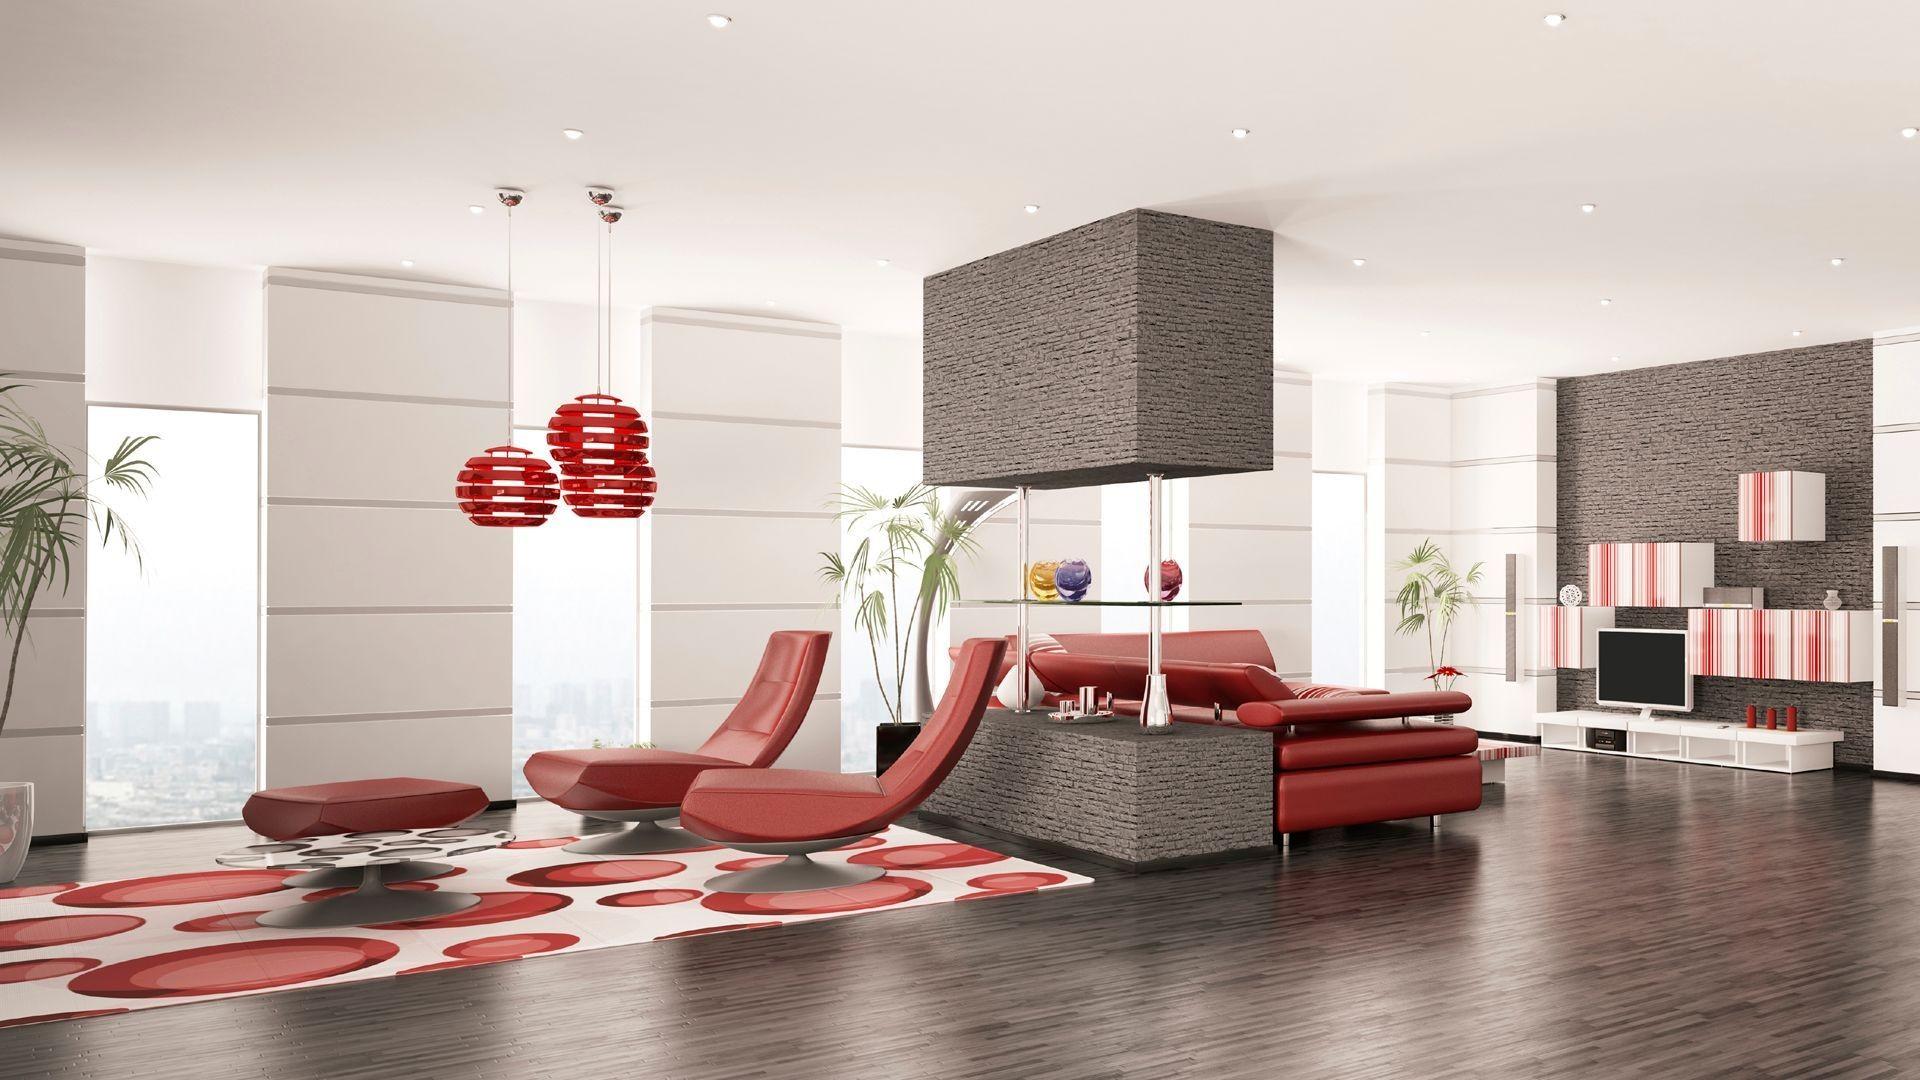 Empresa de reformas de viviendas en Canovelles